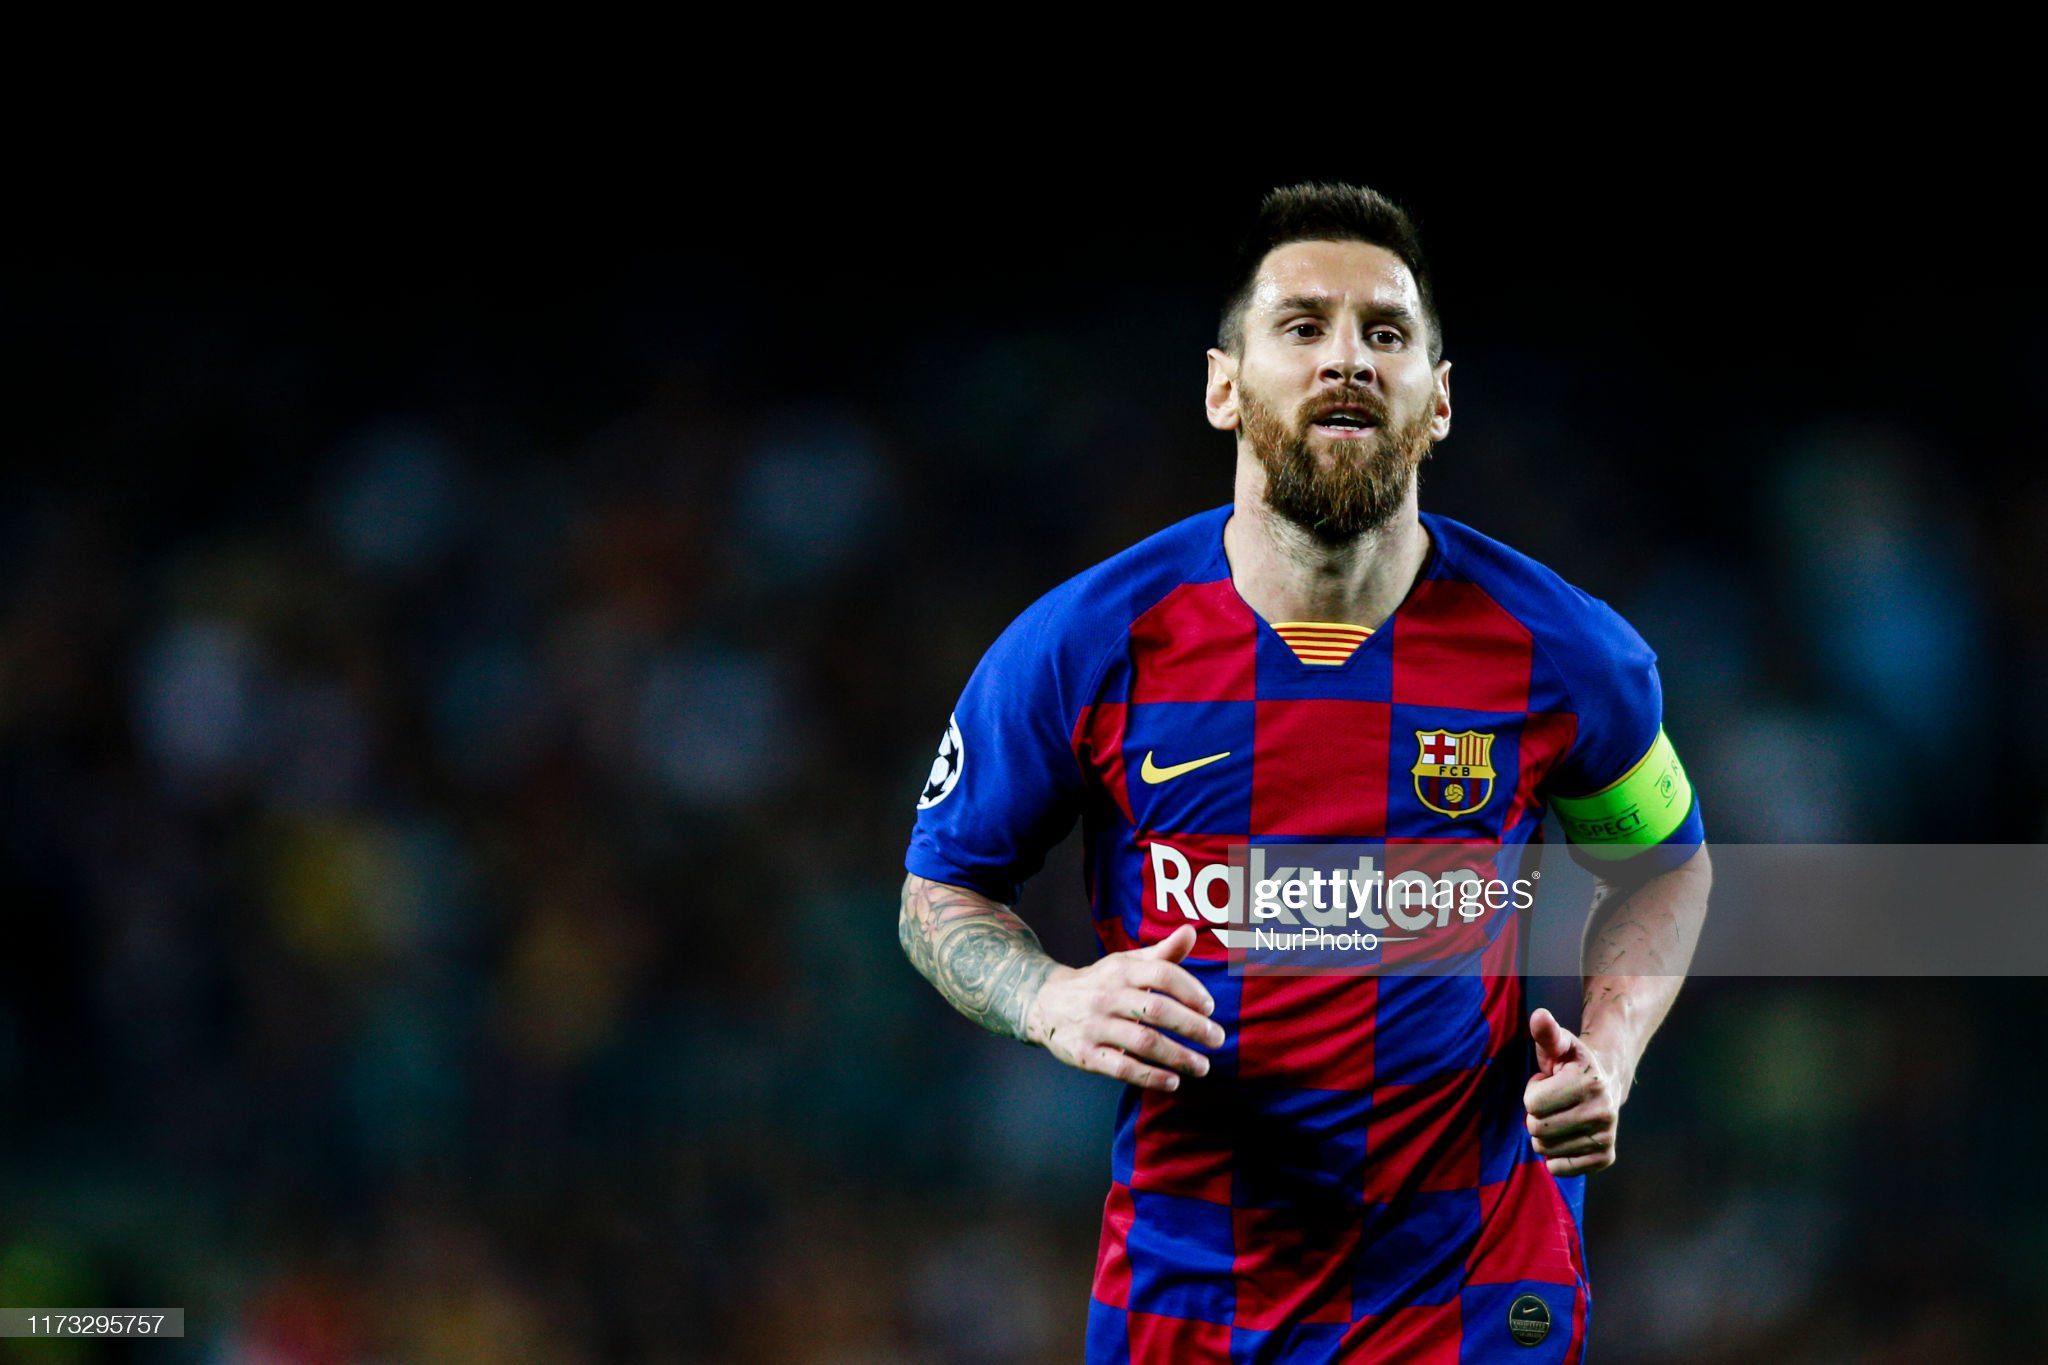 صور مباراة : برشلونة - إنتر 2-1 ( 02-10-2019 )  Lionel-messi-from-argentina-of-fc-barcelona-during-the-uefa-champions-picture-id1173295757?s=2048x2048